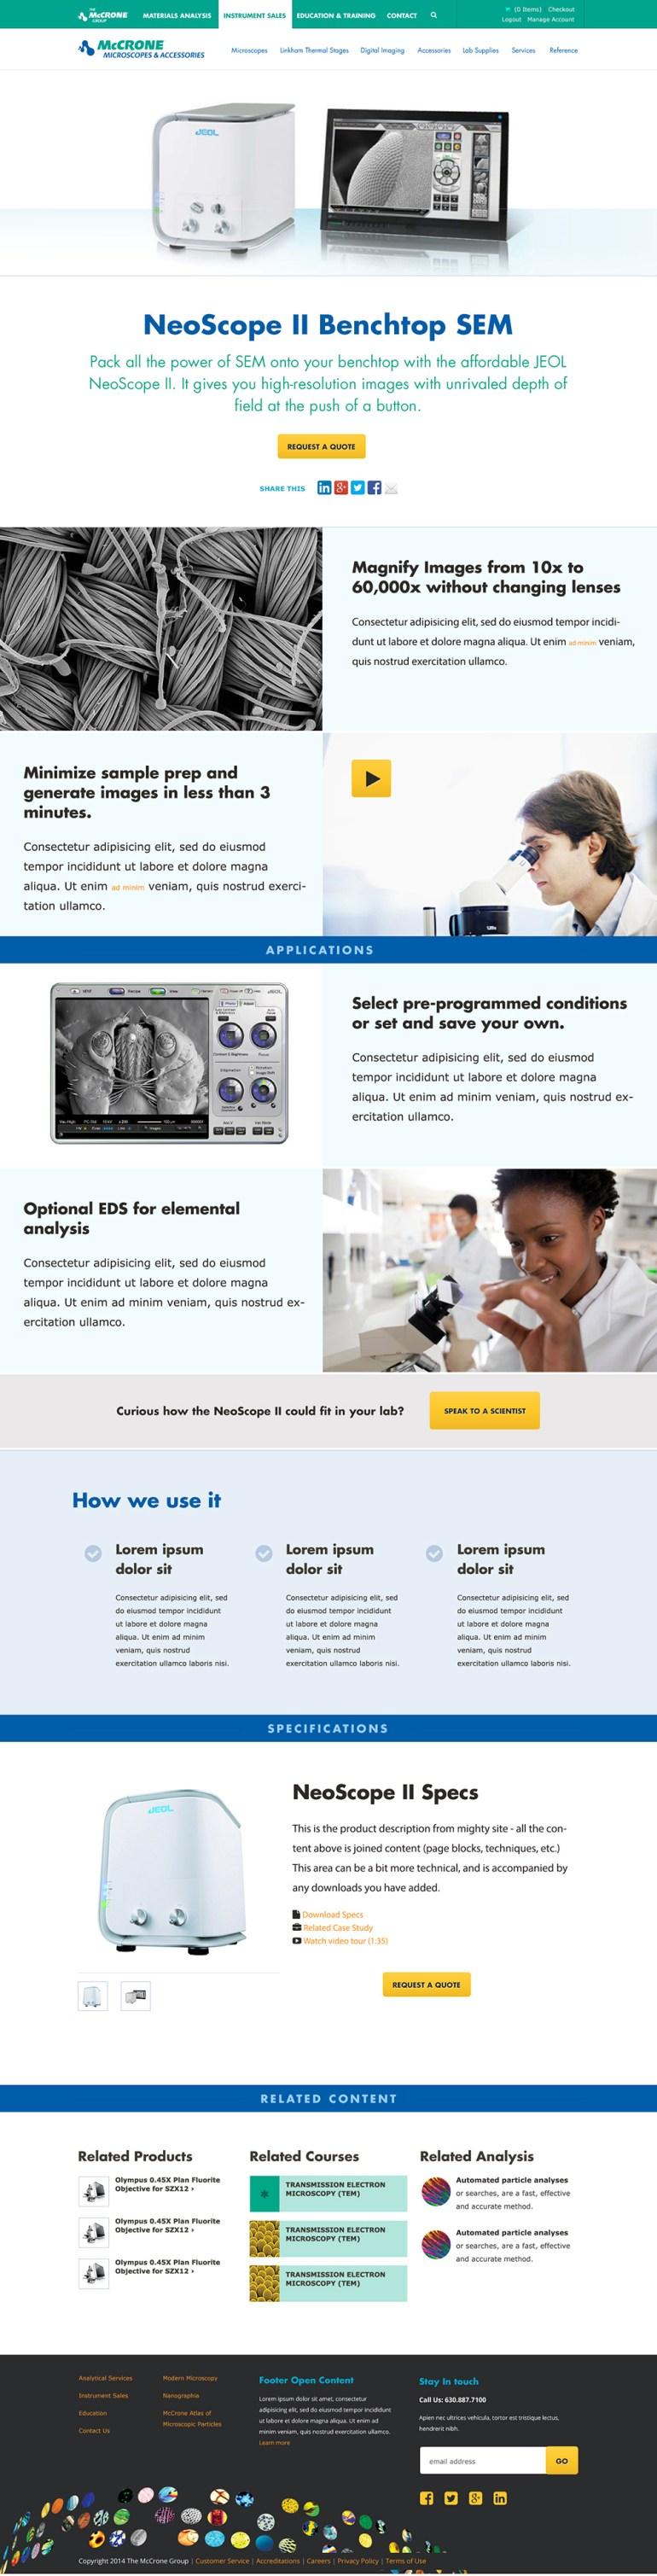 mccrone-ecommerce-designs-longproduct_v3